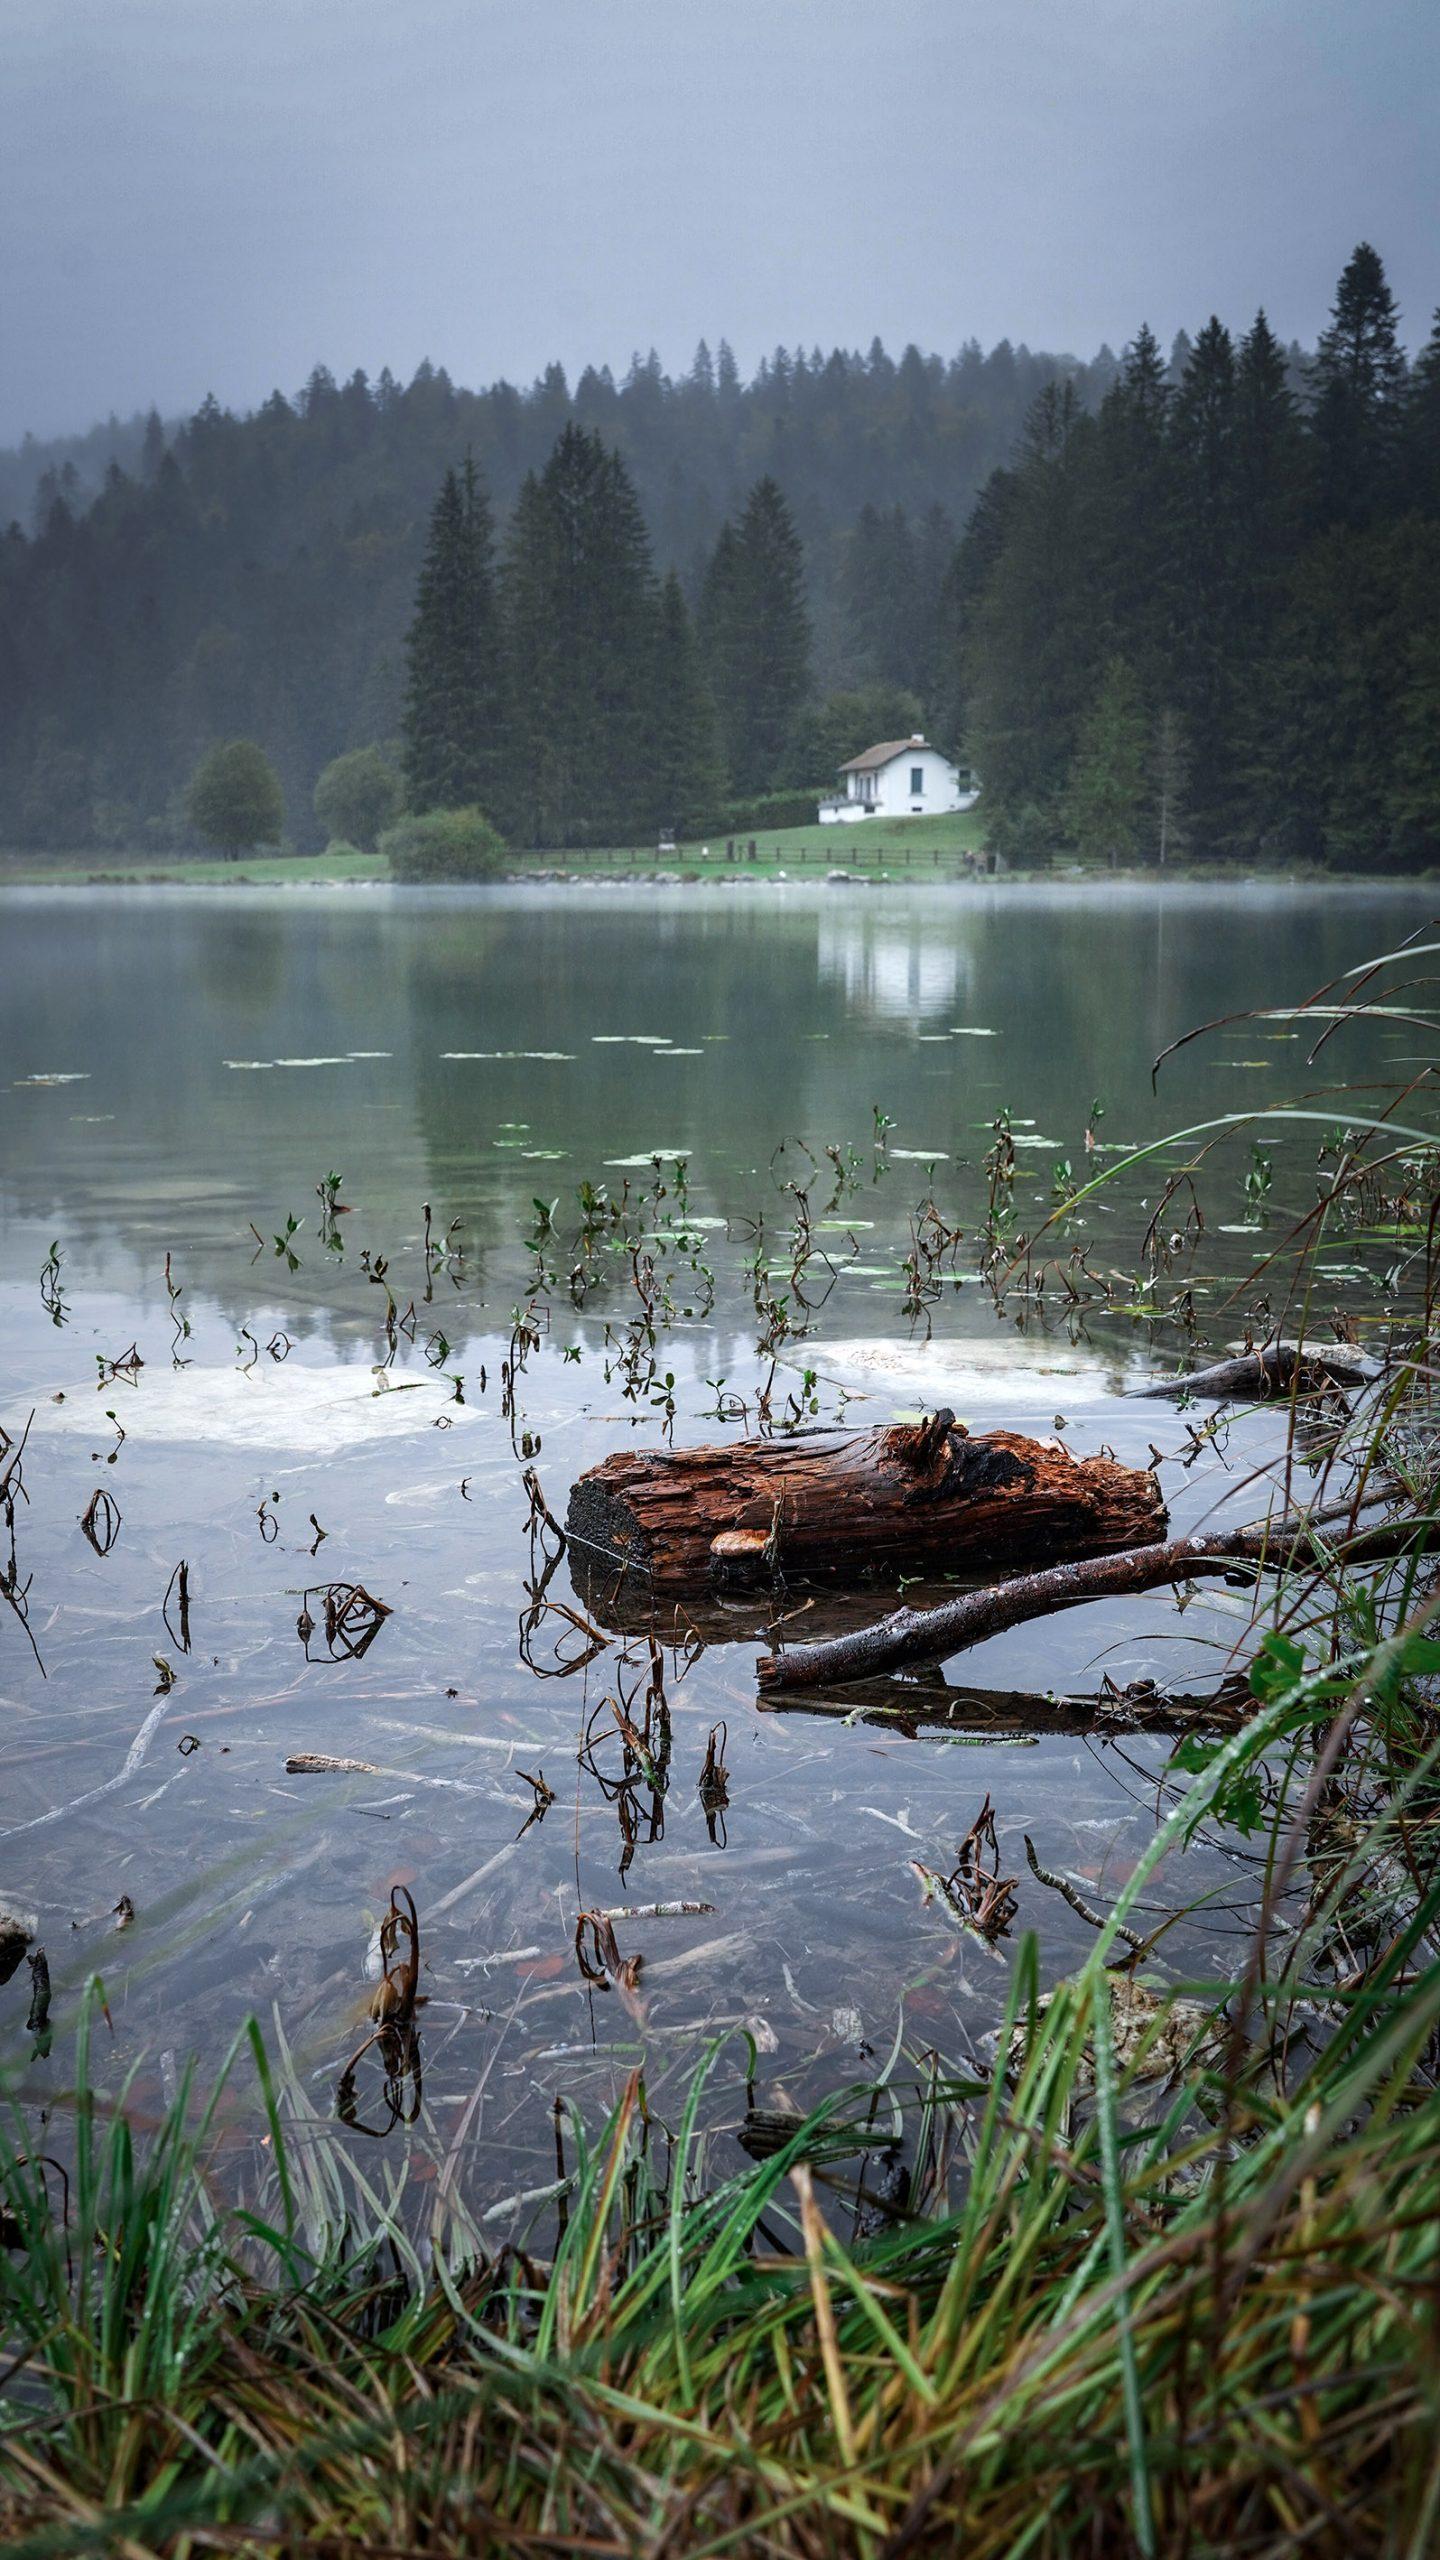 lac Genin automne brouillard nénuphars bois